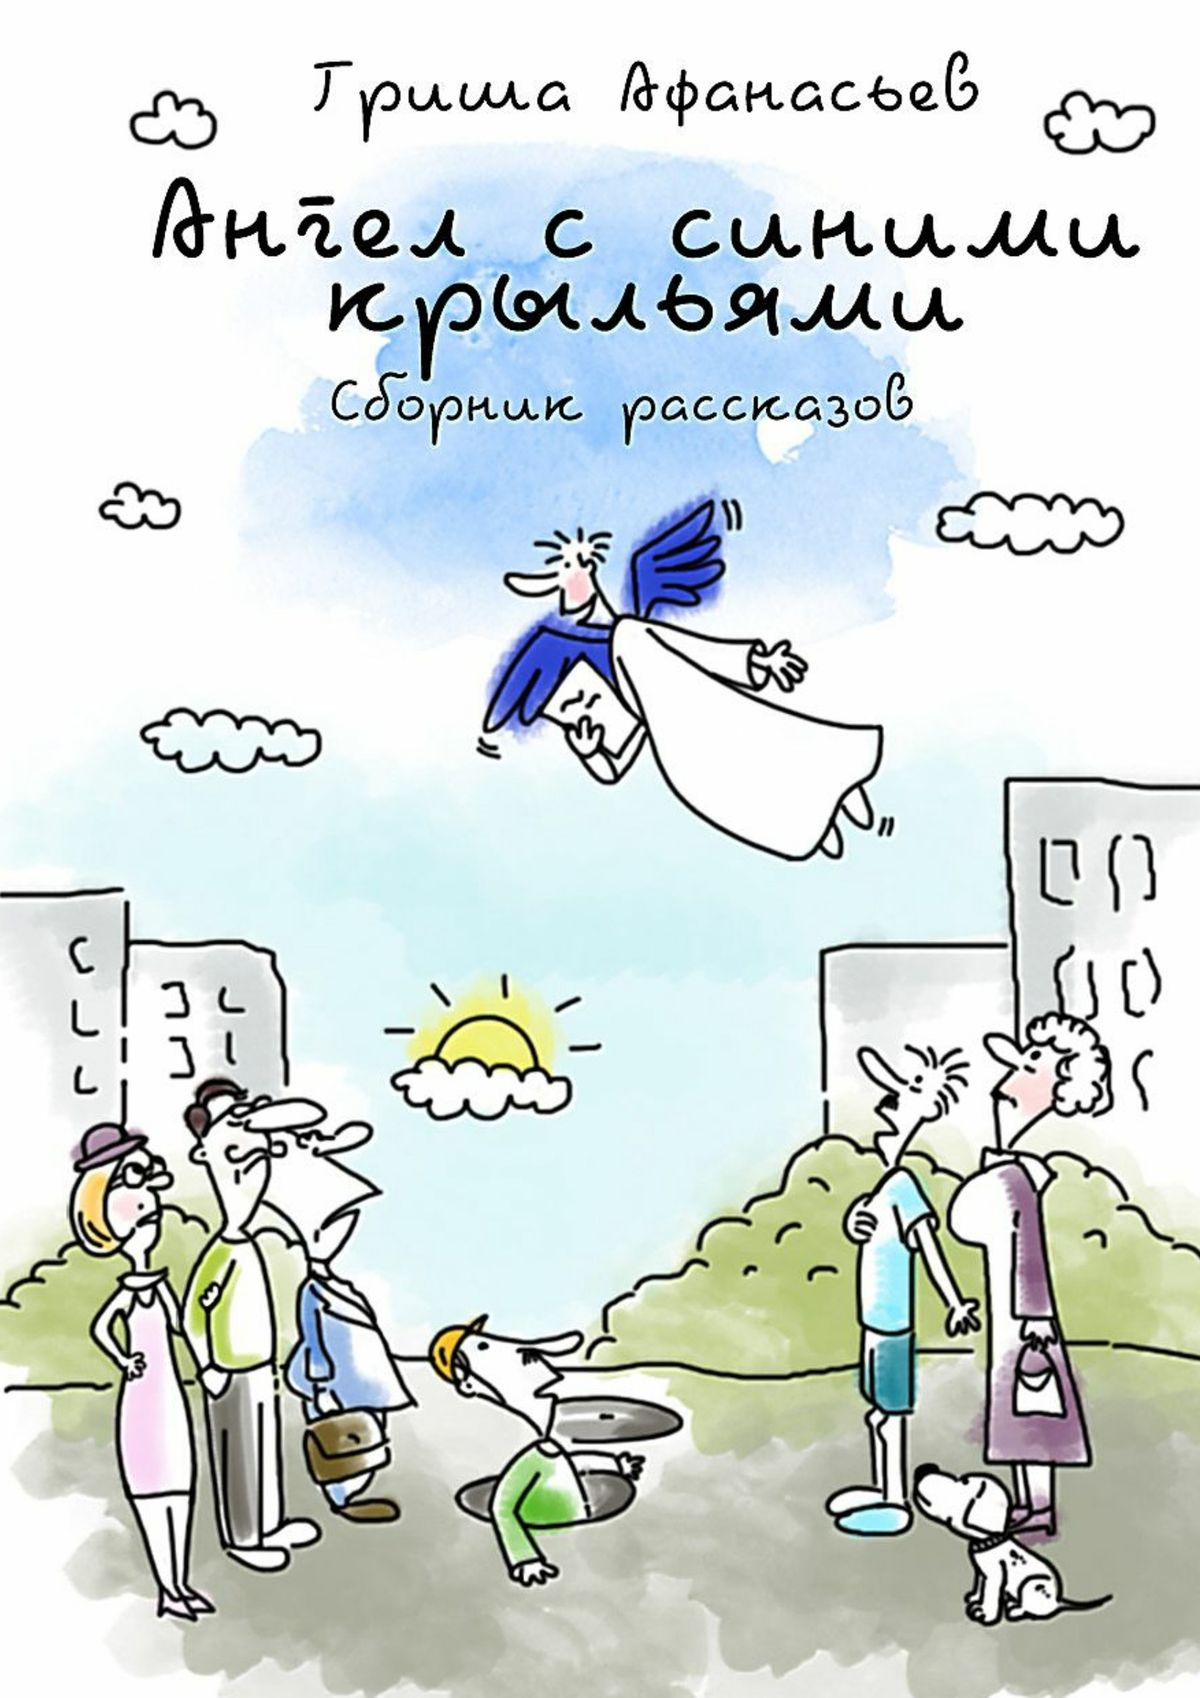 цены Гриша Афанасьев Ангел ссиними крыльями